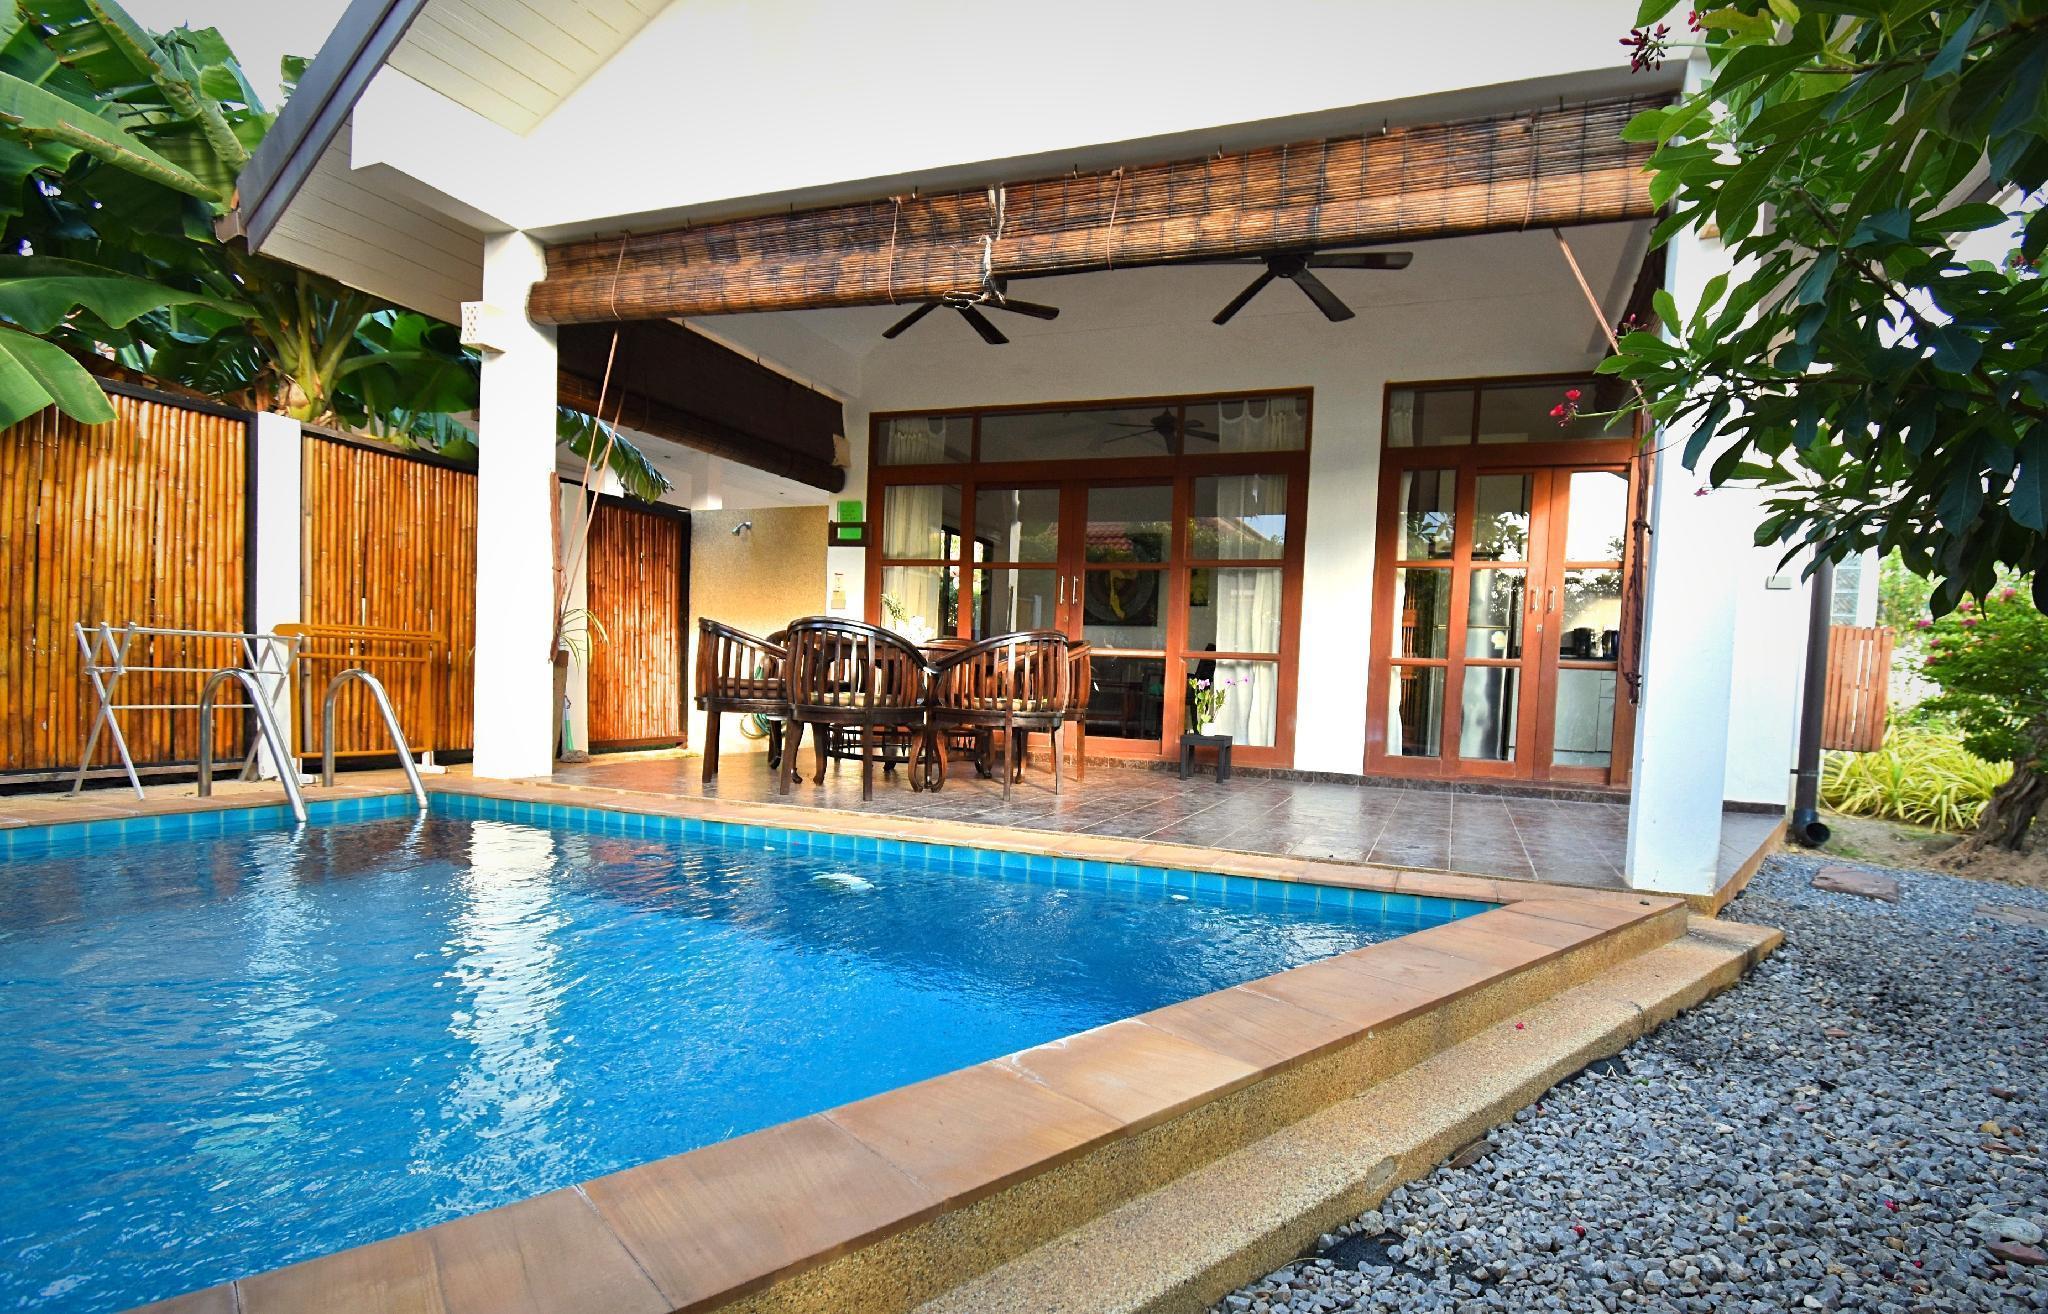 Cozy pool villa - Malee Beach Villa C4 วิลลา 2 ห้องนอน 1 ห้องน้ำส่วนตัว ขนาด 56 ตร.ม. – หาดพระแอะ